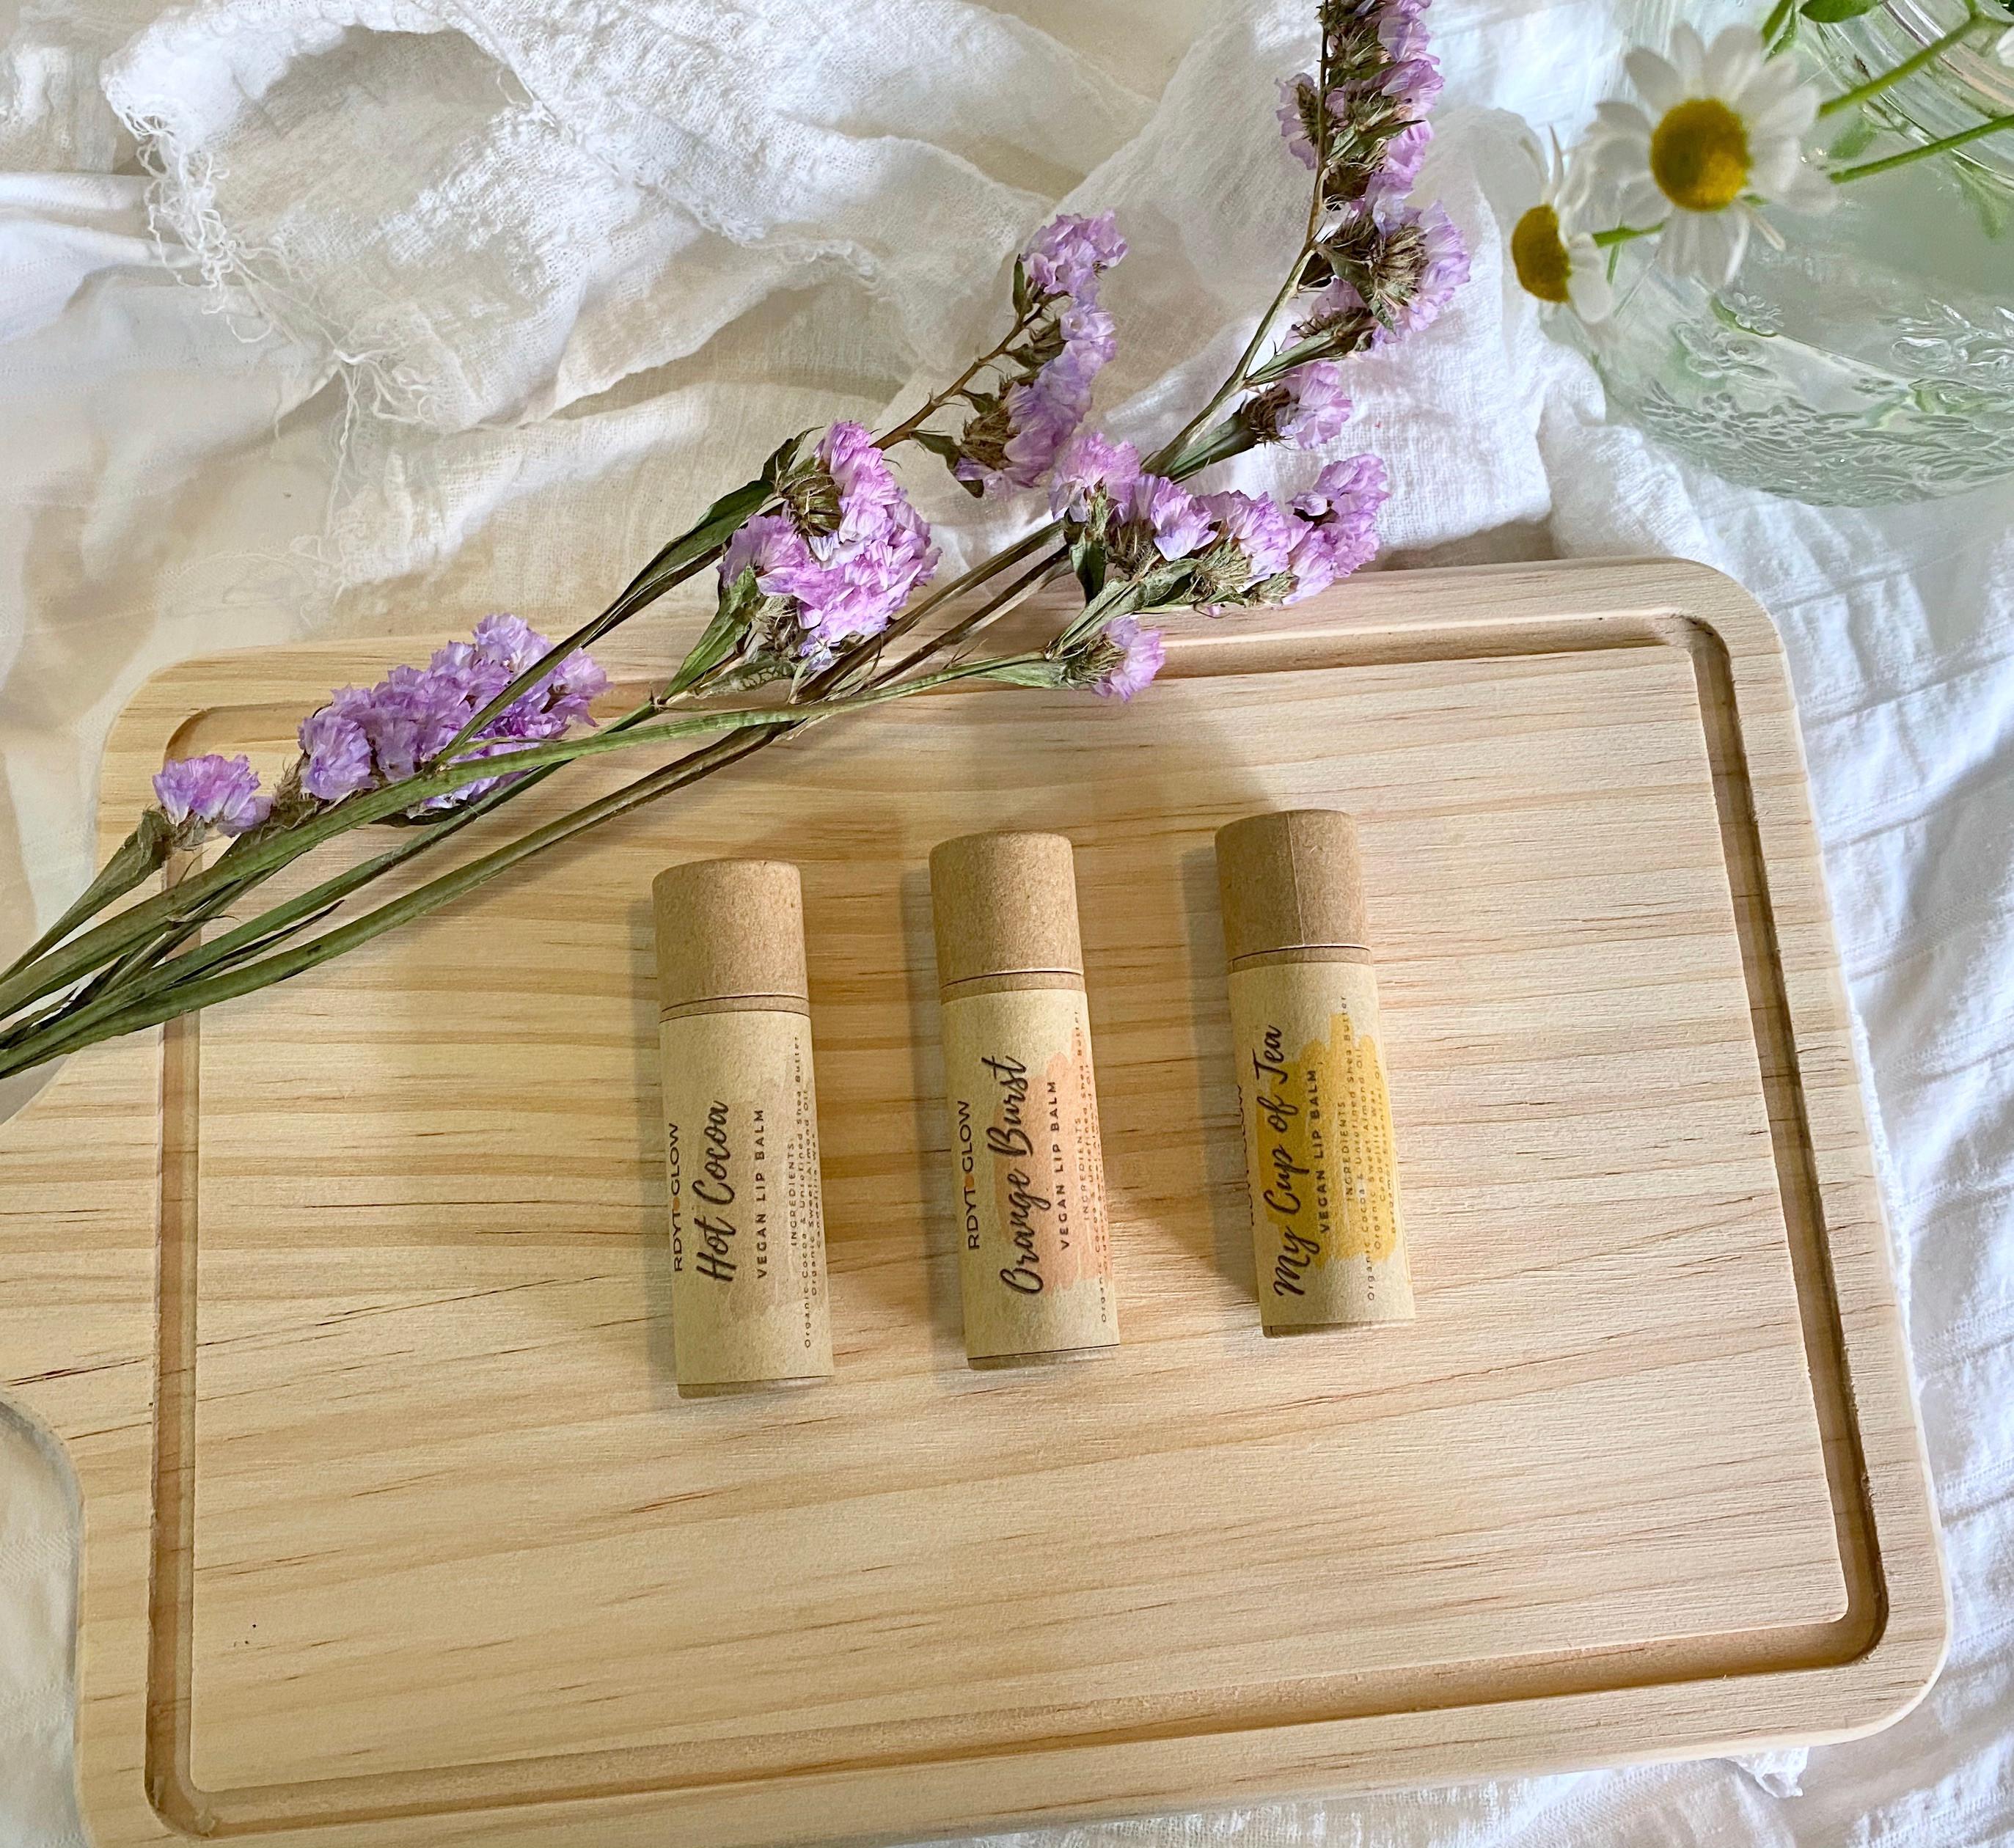 Natural Lip Balm & Body Lotion workshop